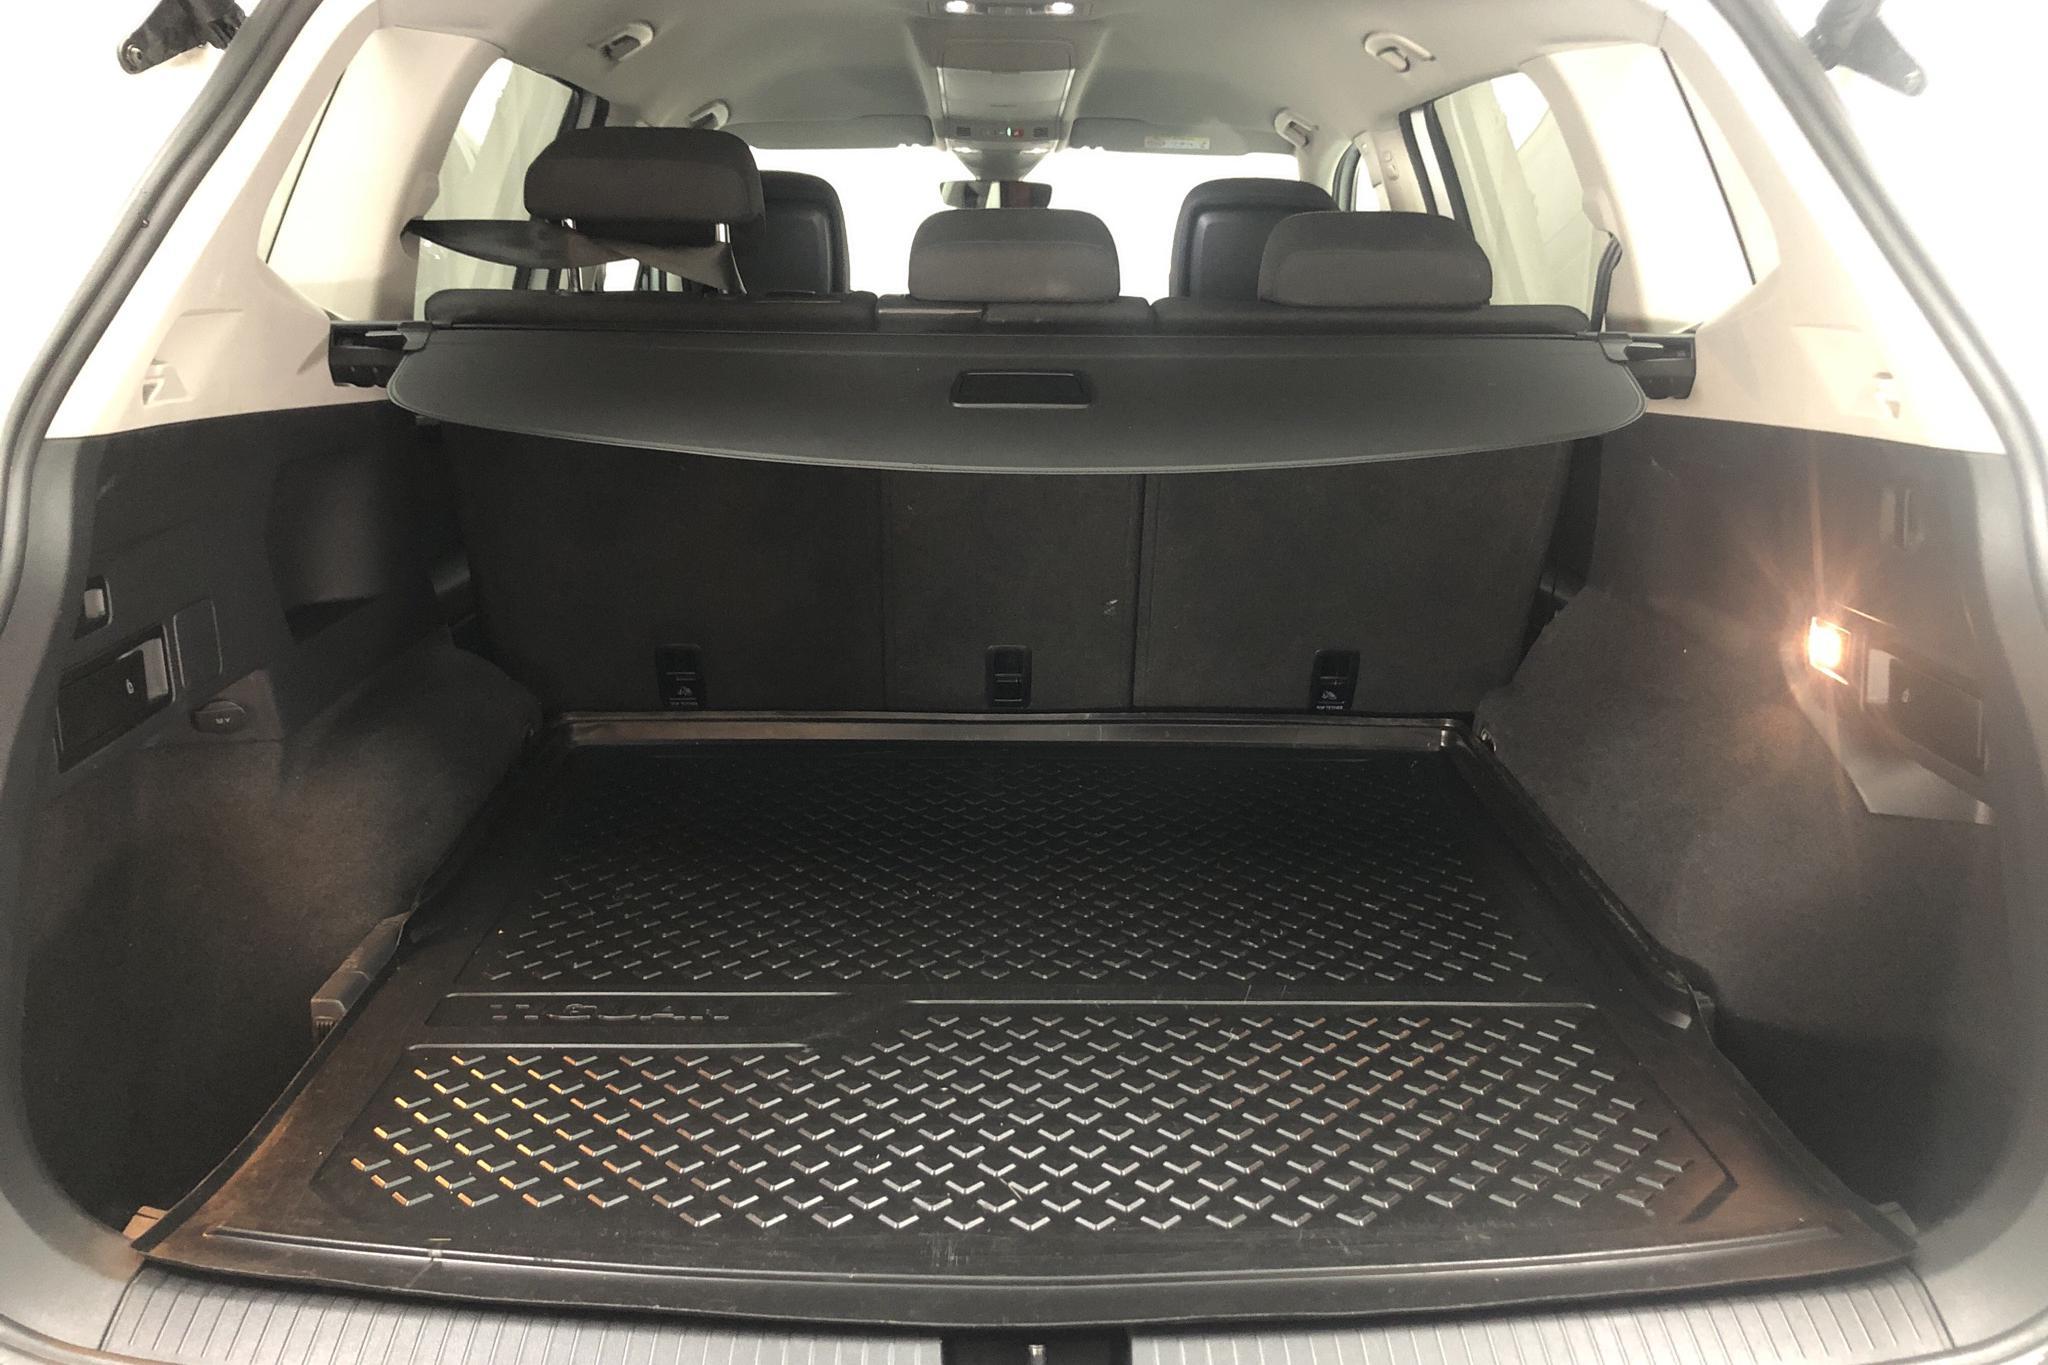 VW Tiguan Allspace 2.0 TDI 4MOTION (190hk) - 7 275 mil - Automat - vit - 2019